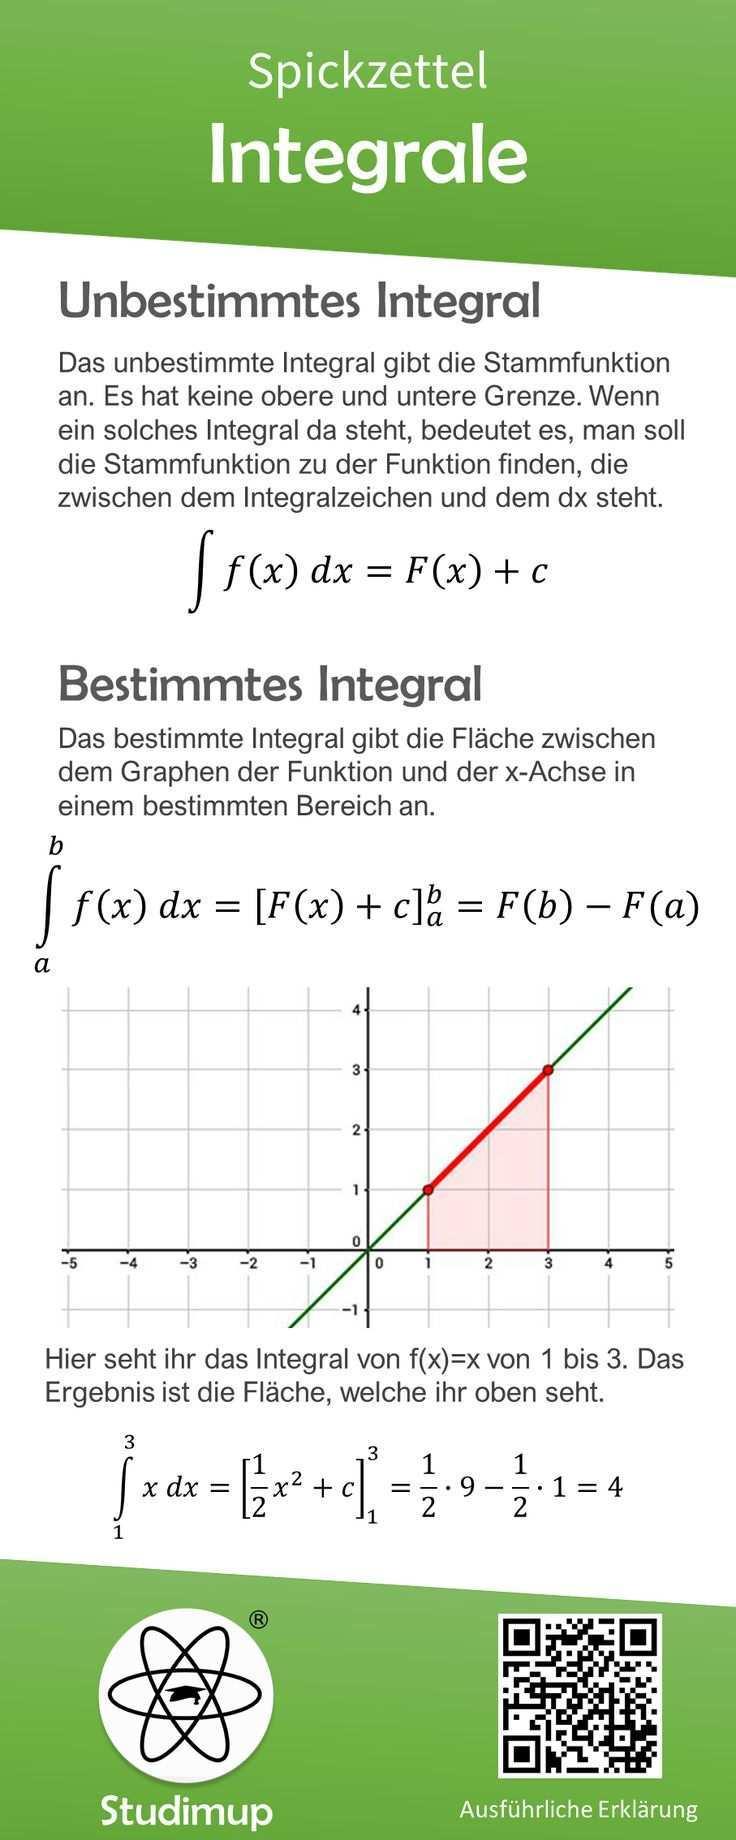 Integrale Spickzettel Spickzettel Nachhilfe Mathe Mathematik Lernen